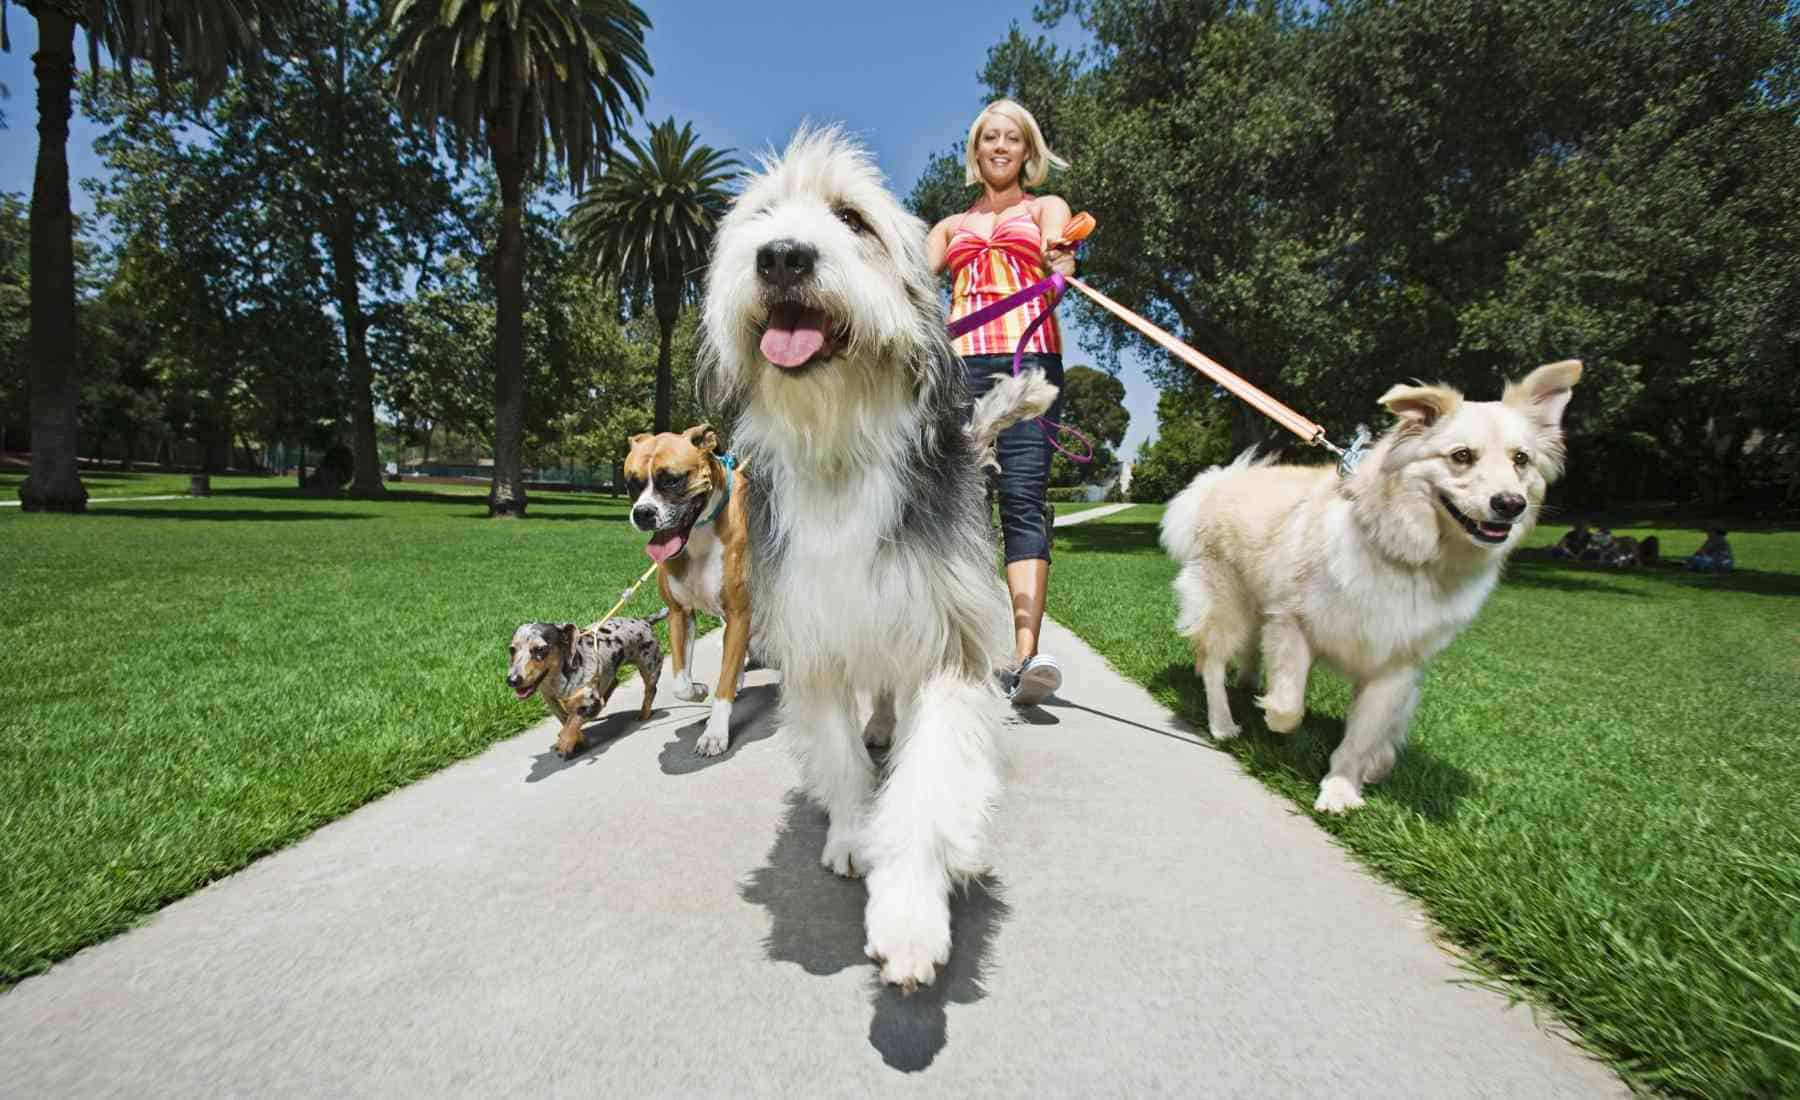 Make $500 a Day - Dog Walking